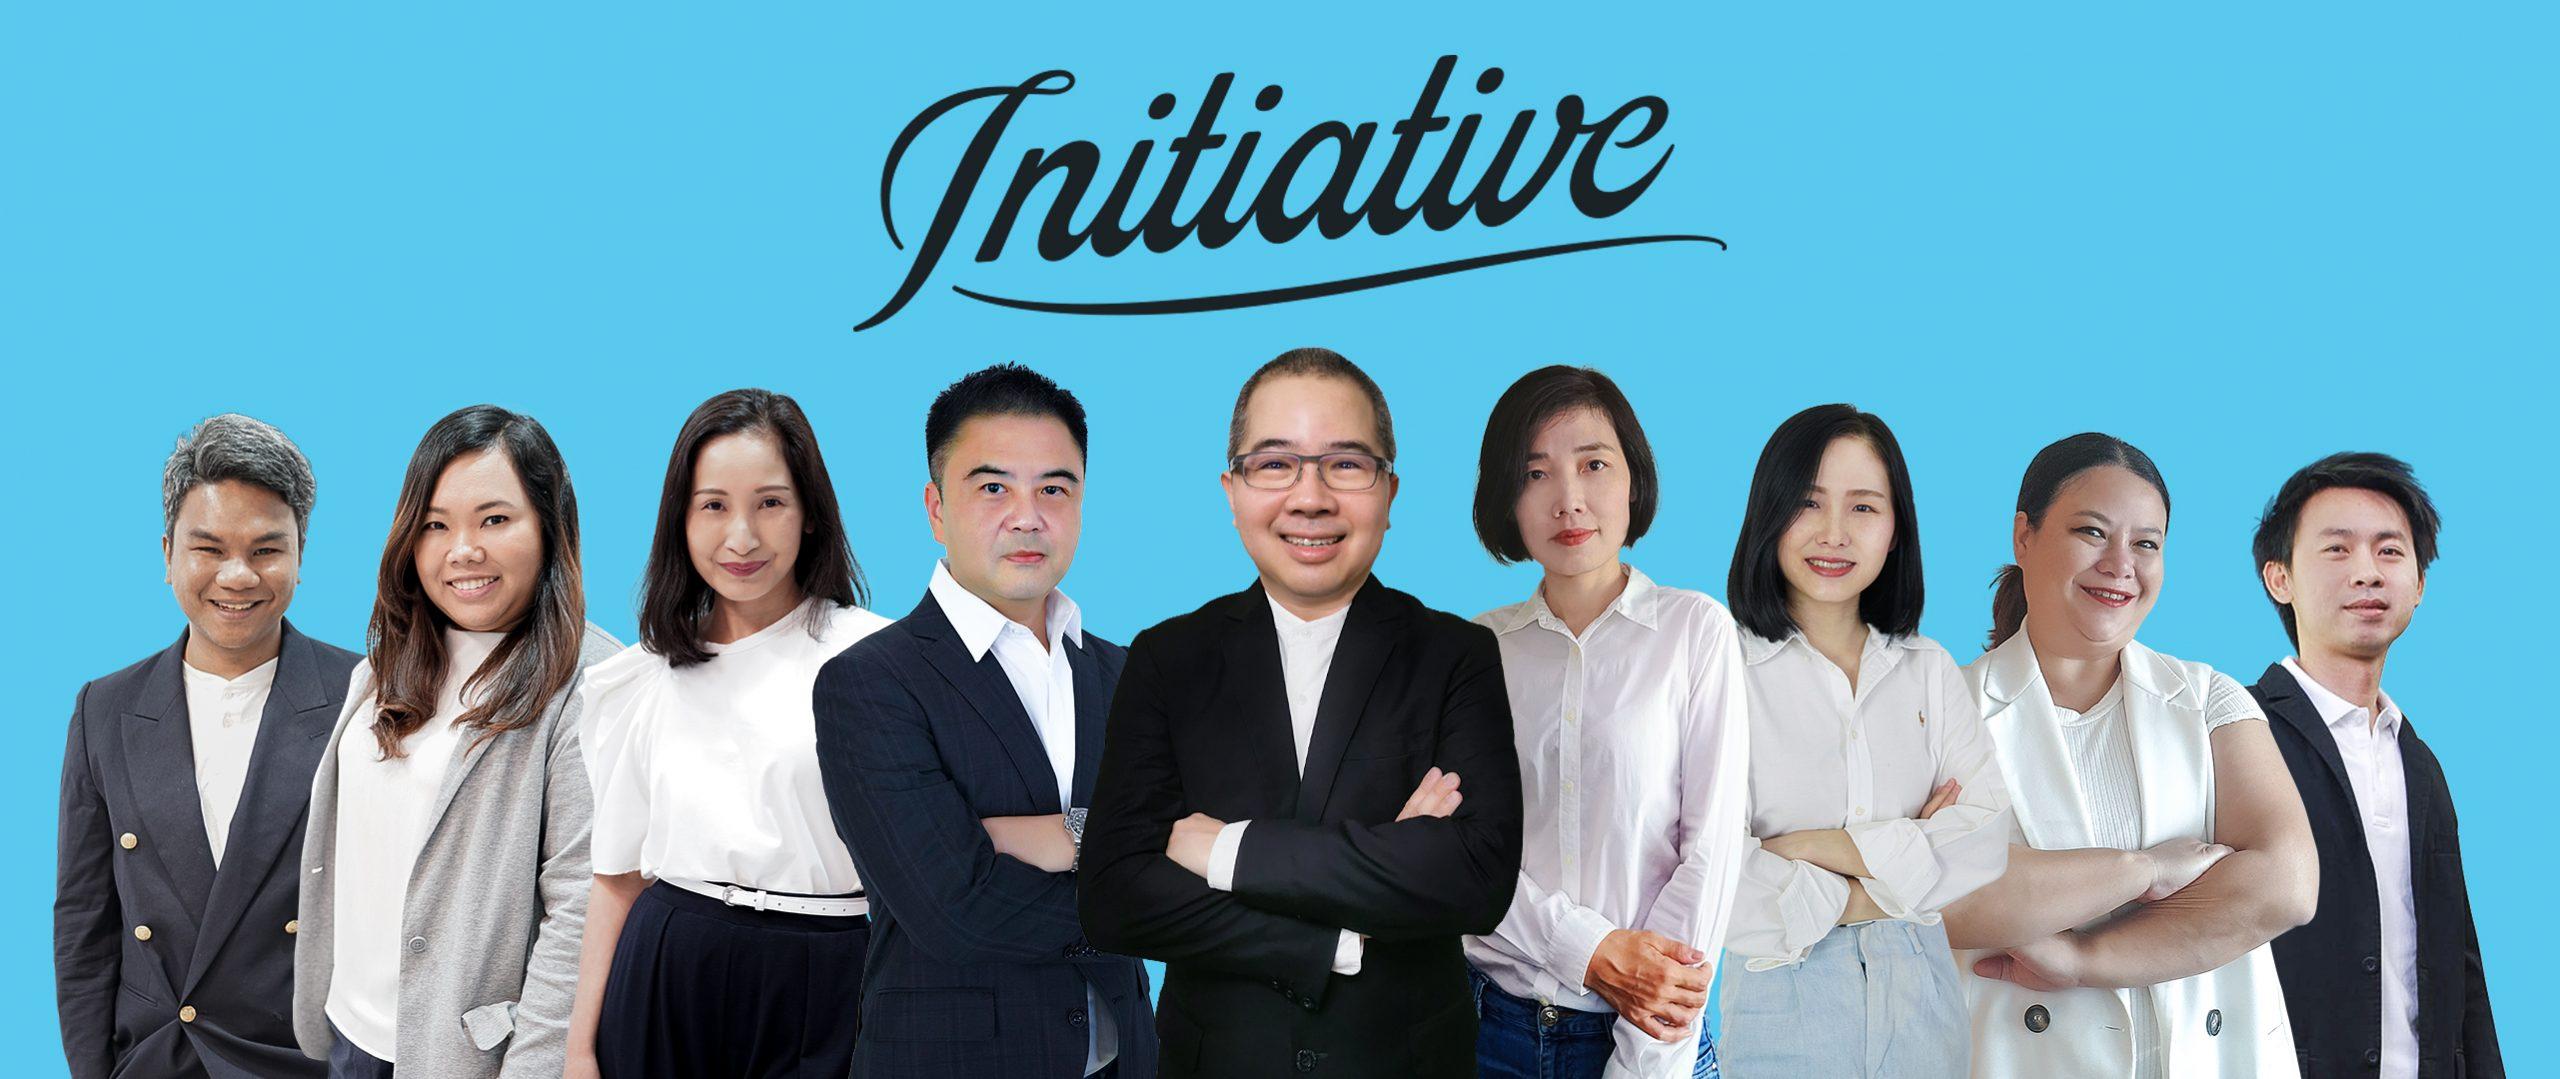 Initiative IPG Mediabrands Thailand ดร. สร เกียรติคณารัตน์ อินิชิเอทีฟ ไอพีจี มีเดียแบรนด์ส